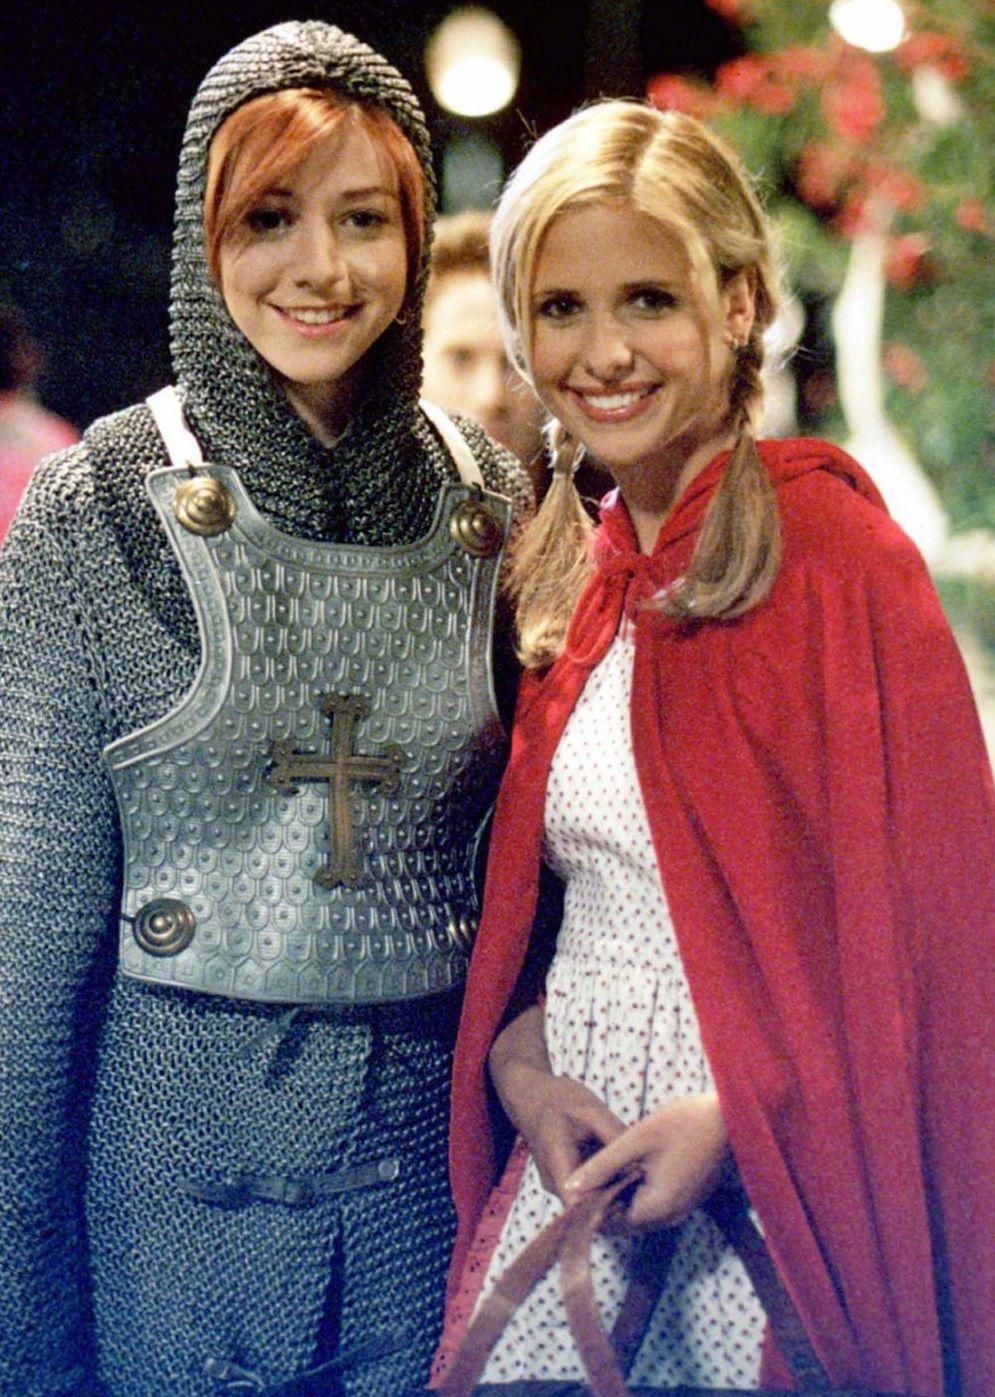 Buffy The Vampire Slayer - Halloween Sarah Michelle Gellar and Alyson Hannigan